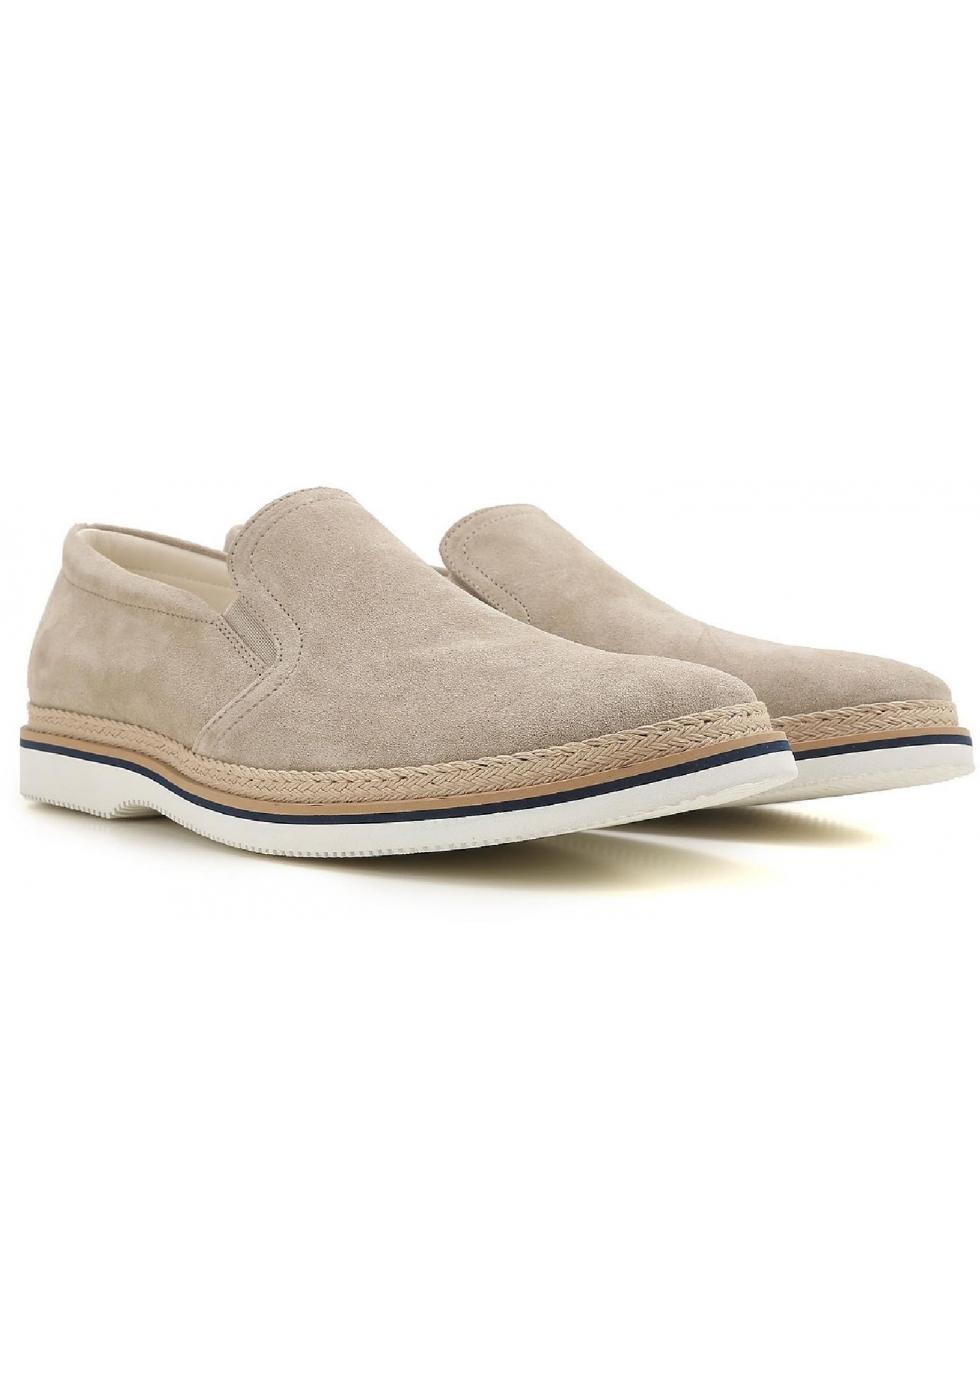 Hogan Shoes Size Chart